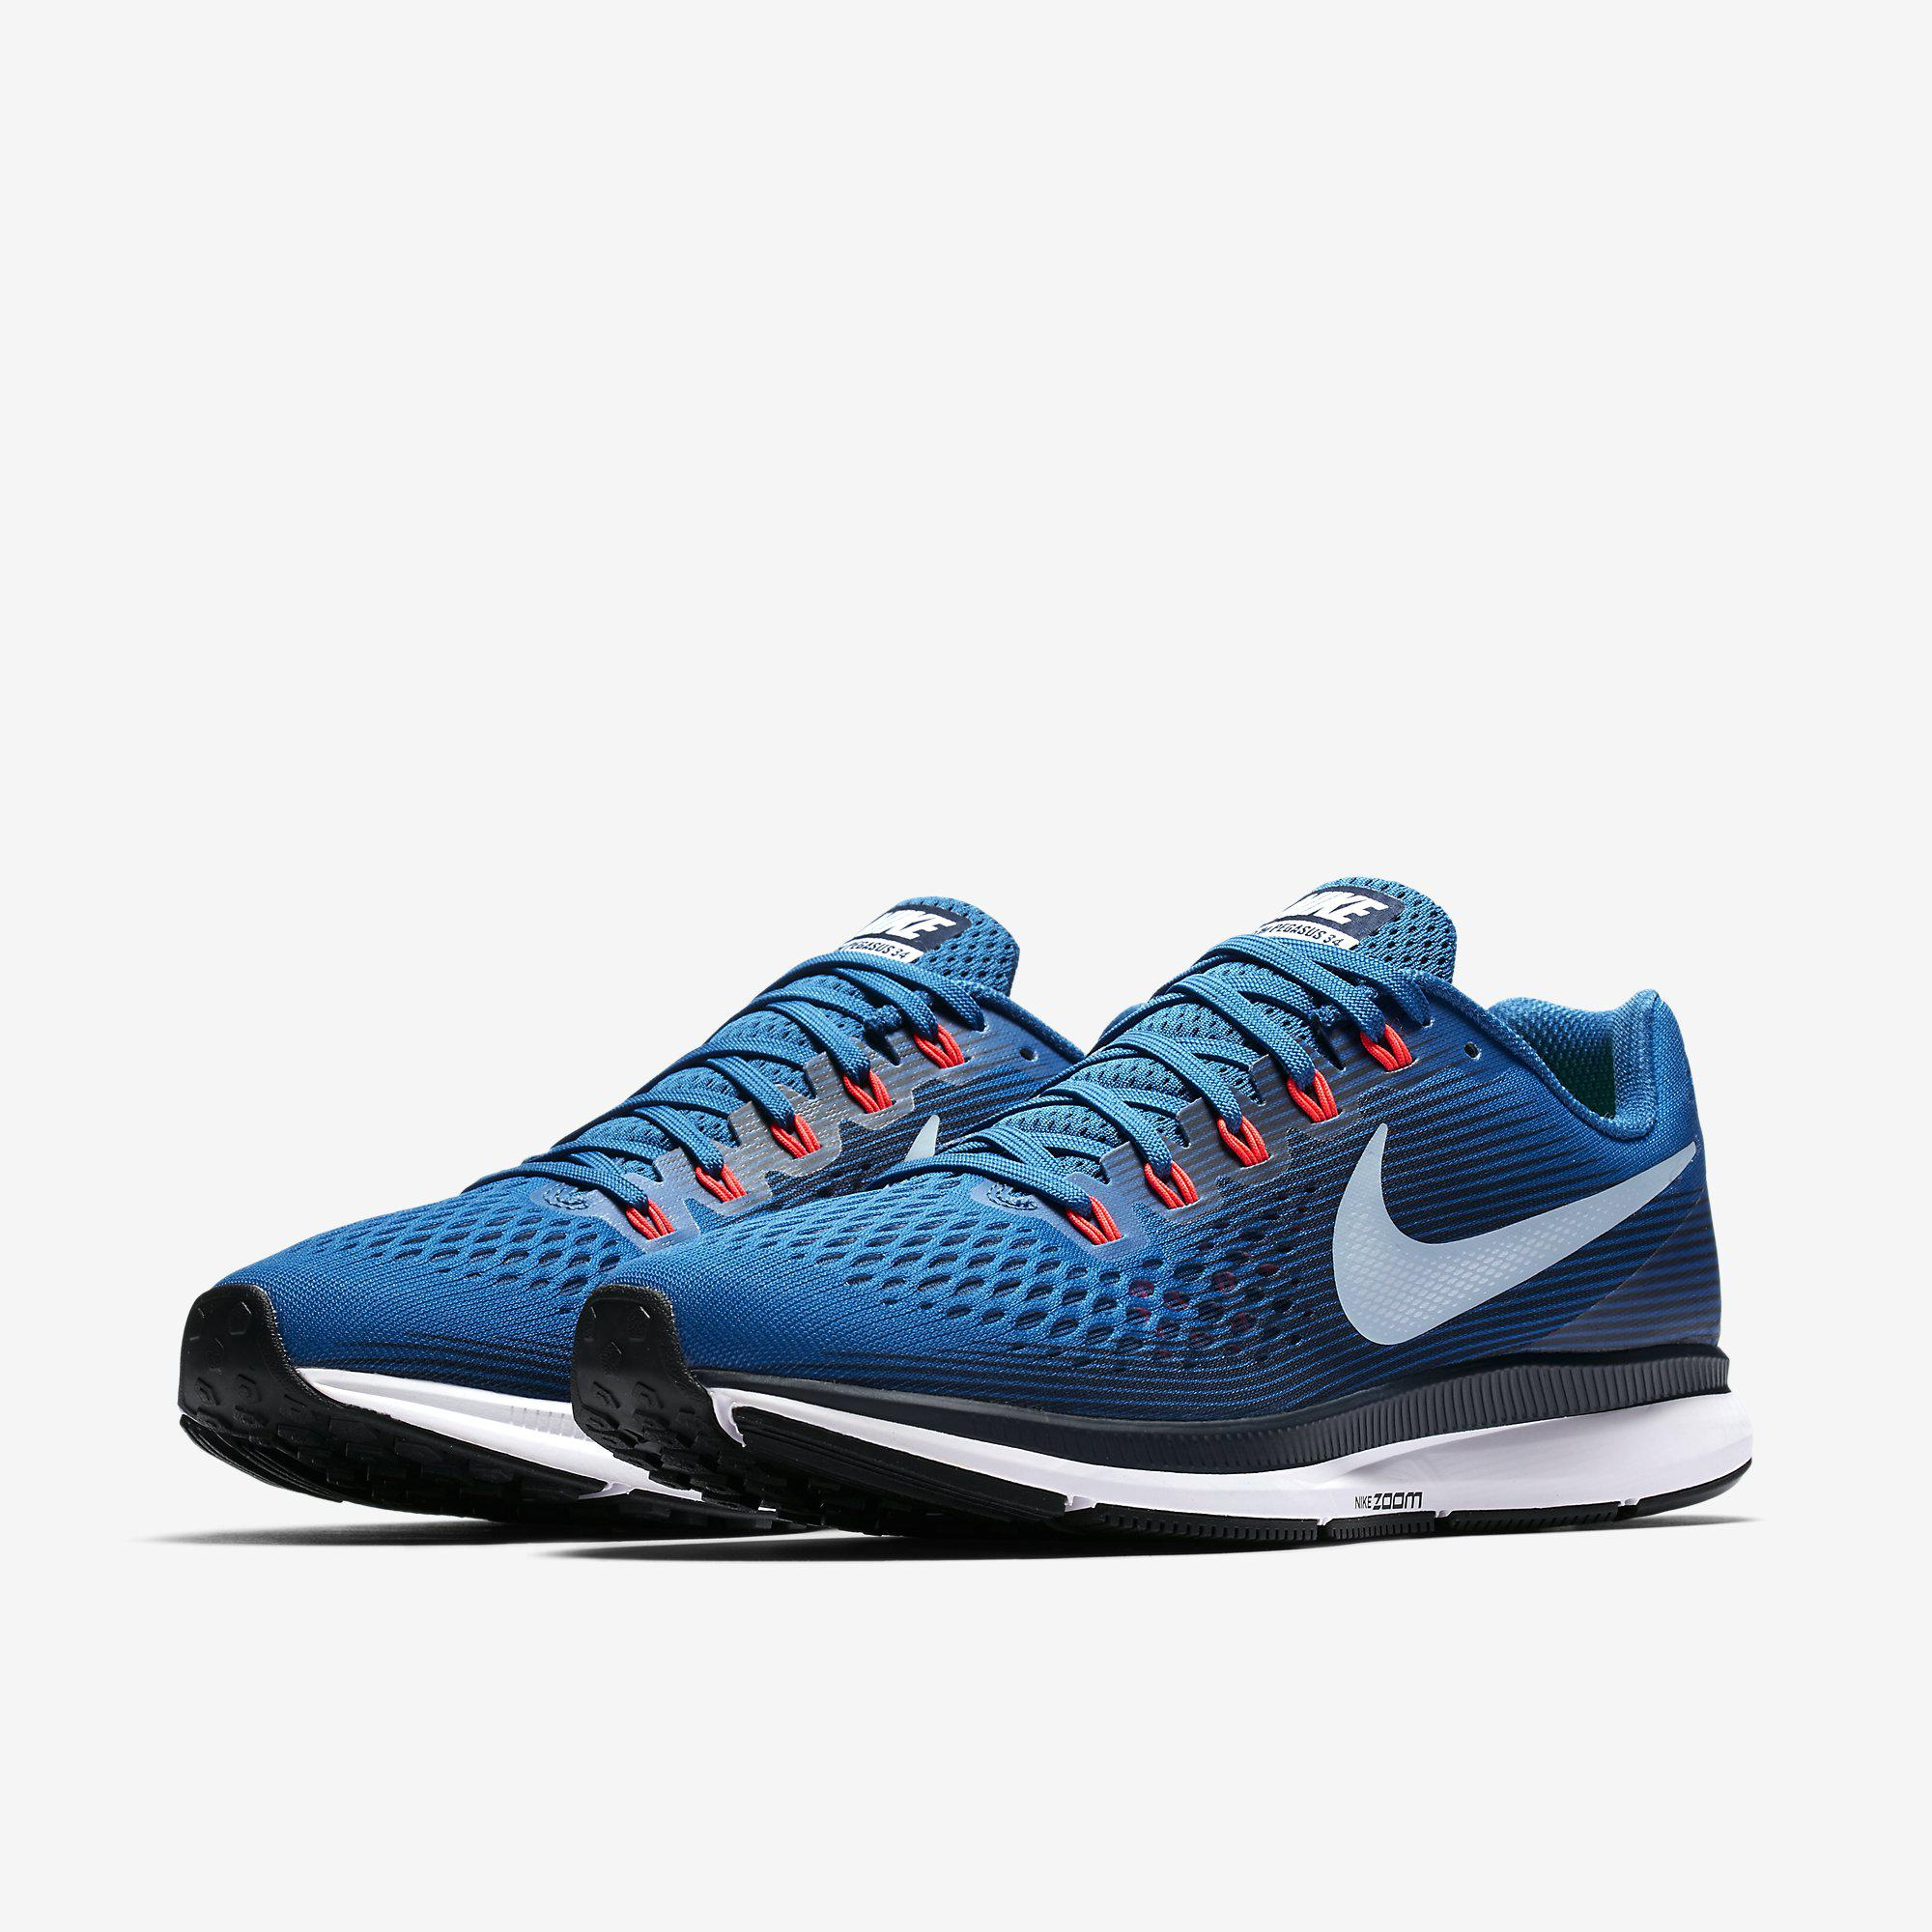 half off 726cb 13ab7 Nike Mens Air Zoom Pegasus 34 Running Shoes - Blue Jay